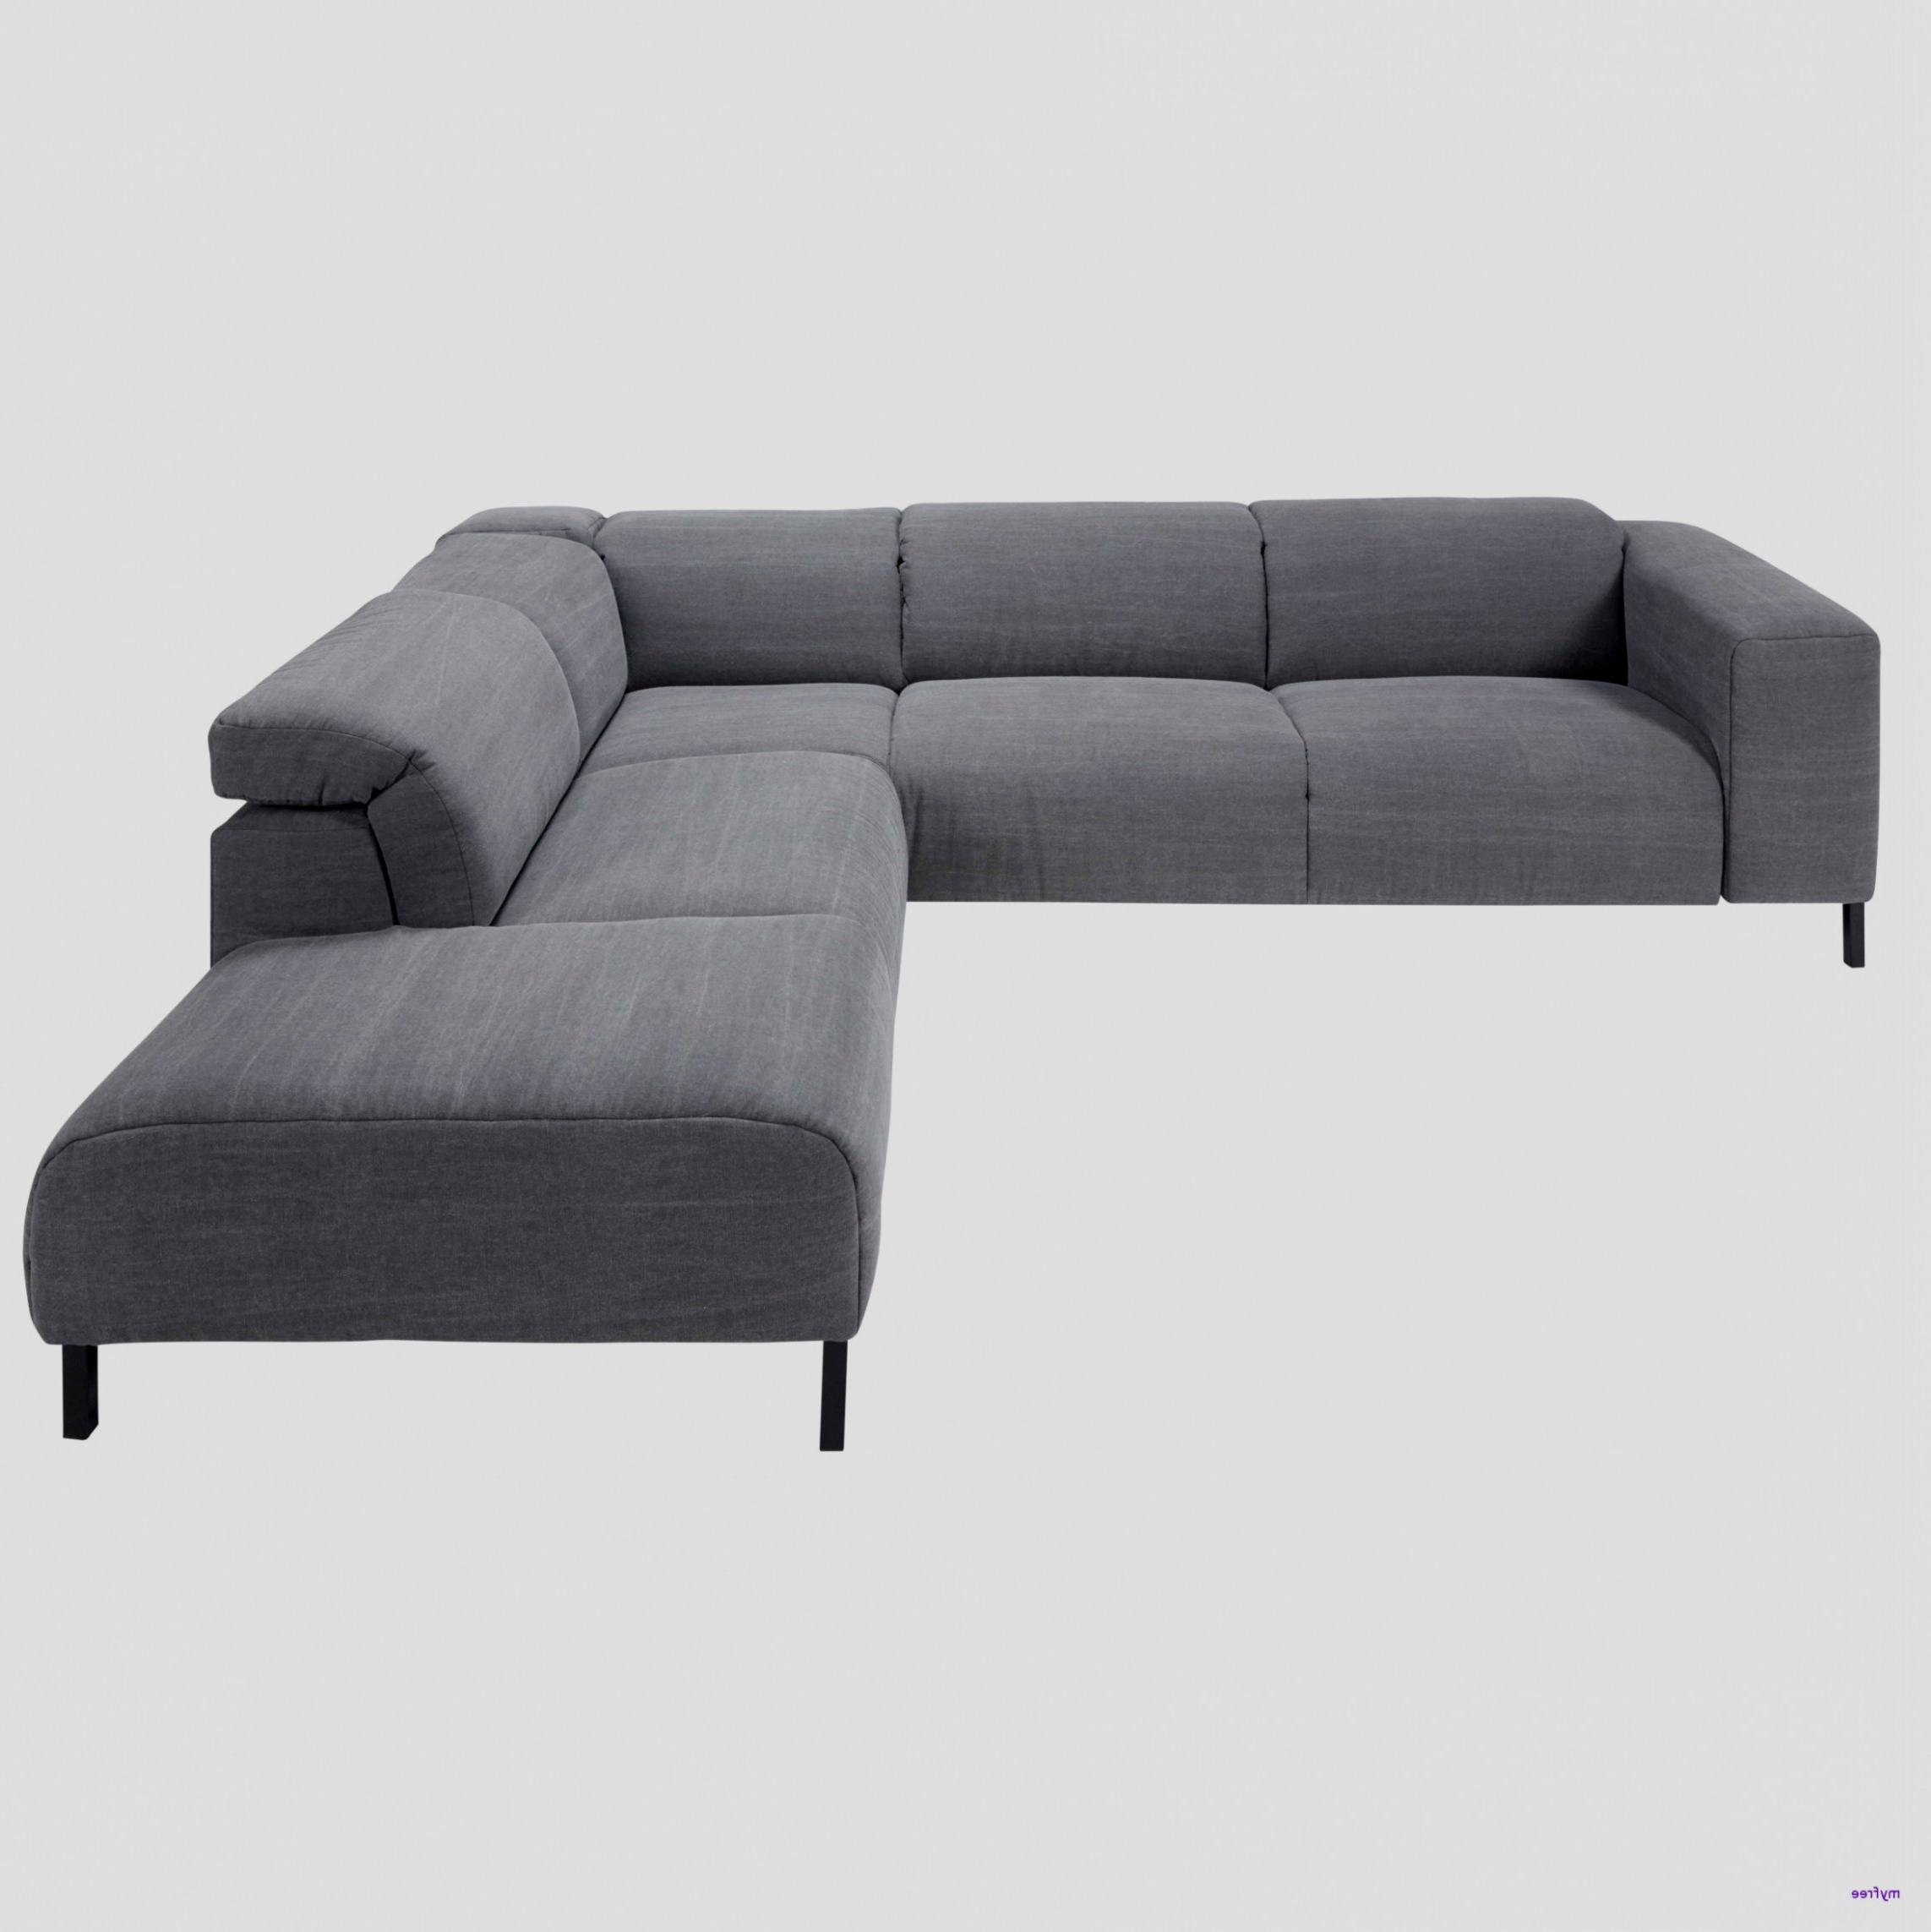 Sof 3 plazas barato simple sofa cama plazas barato for Sofas comodos y baratos